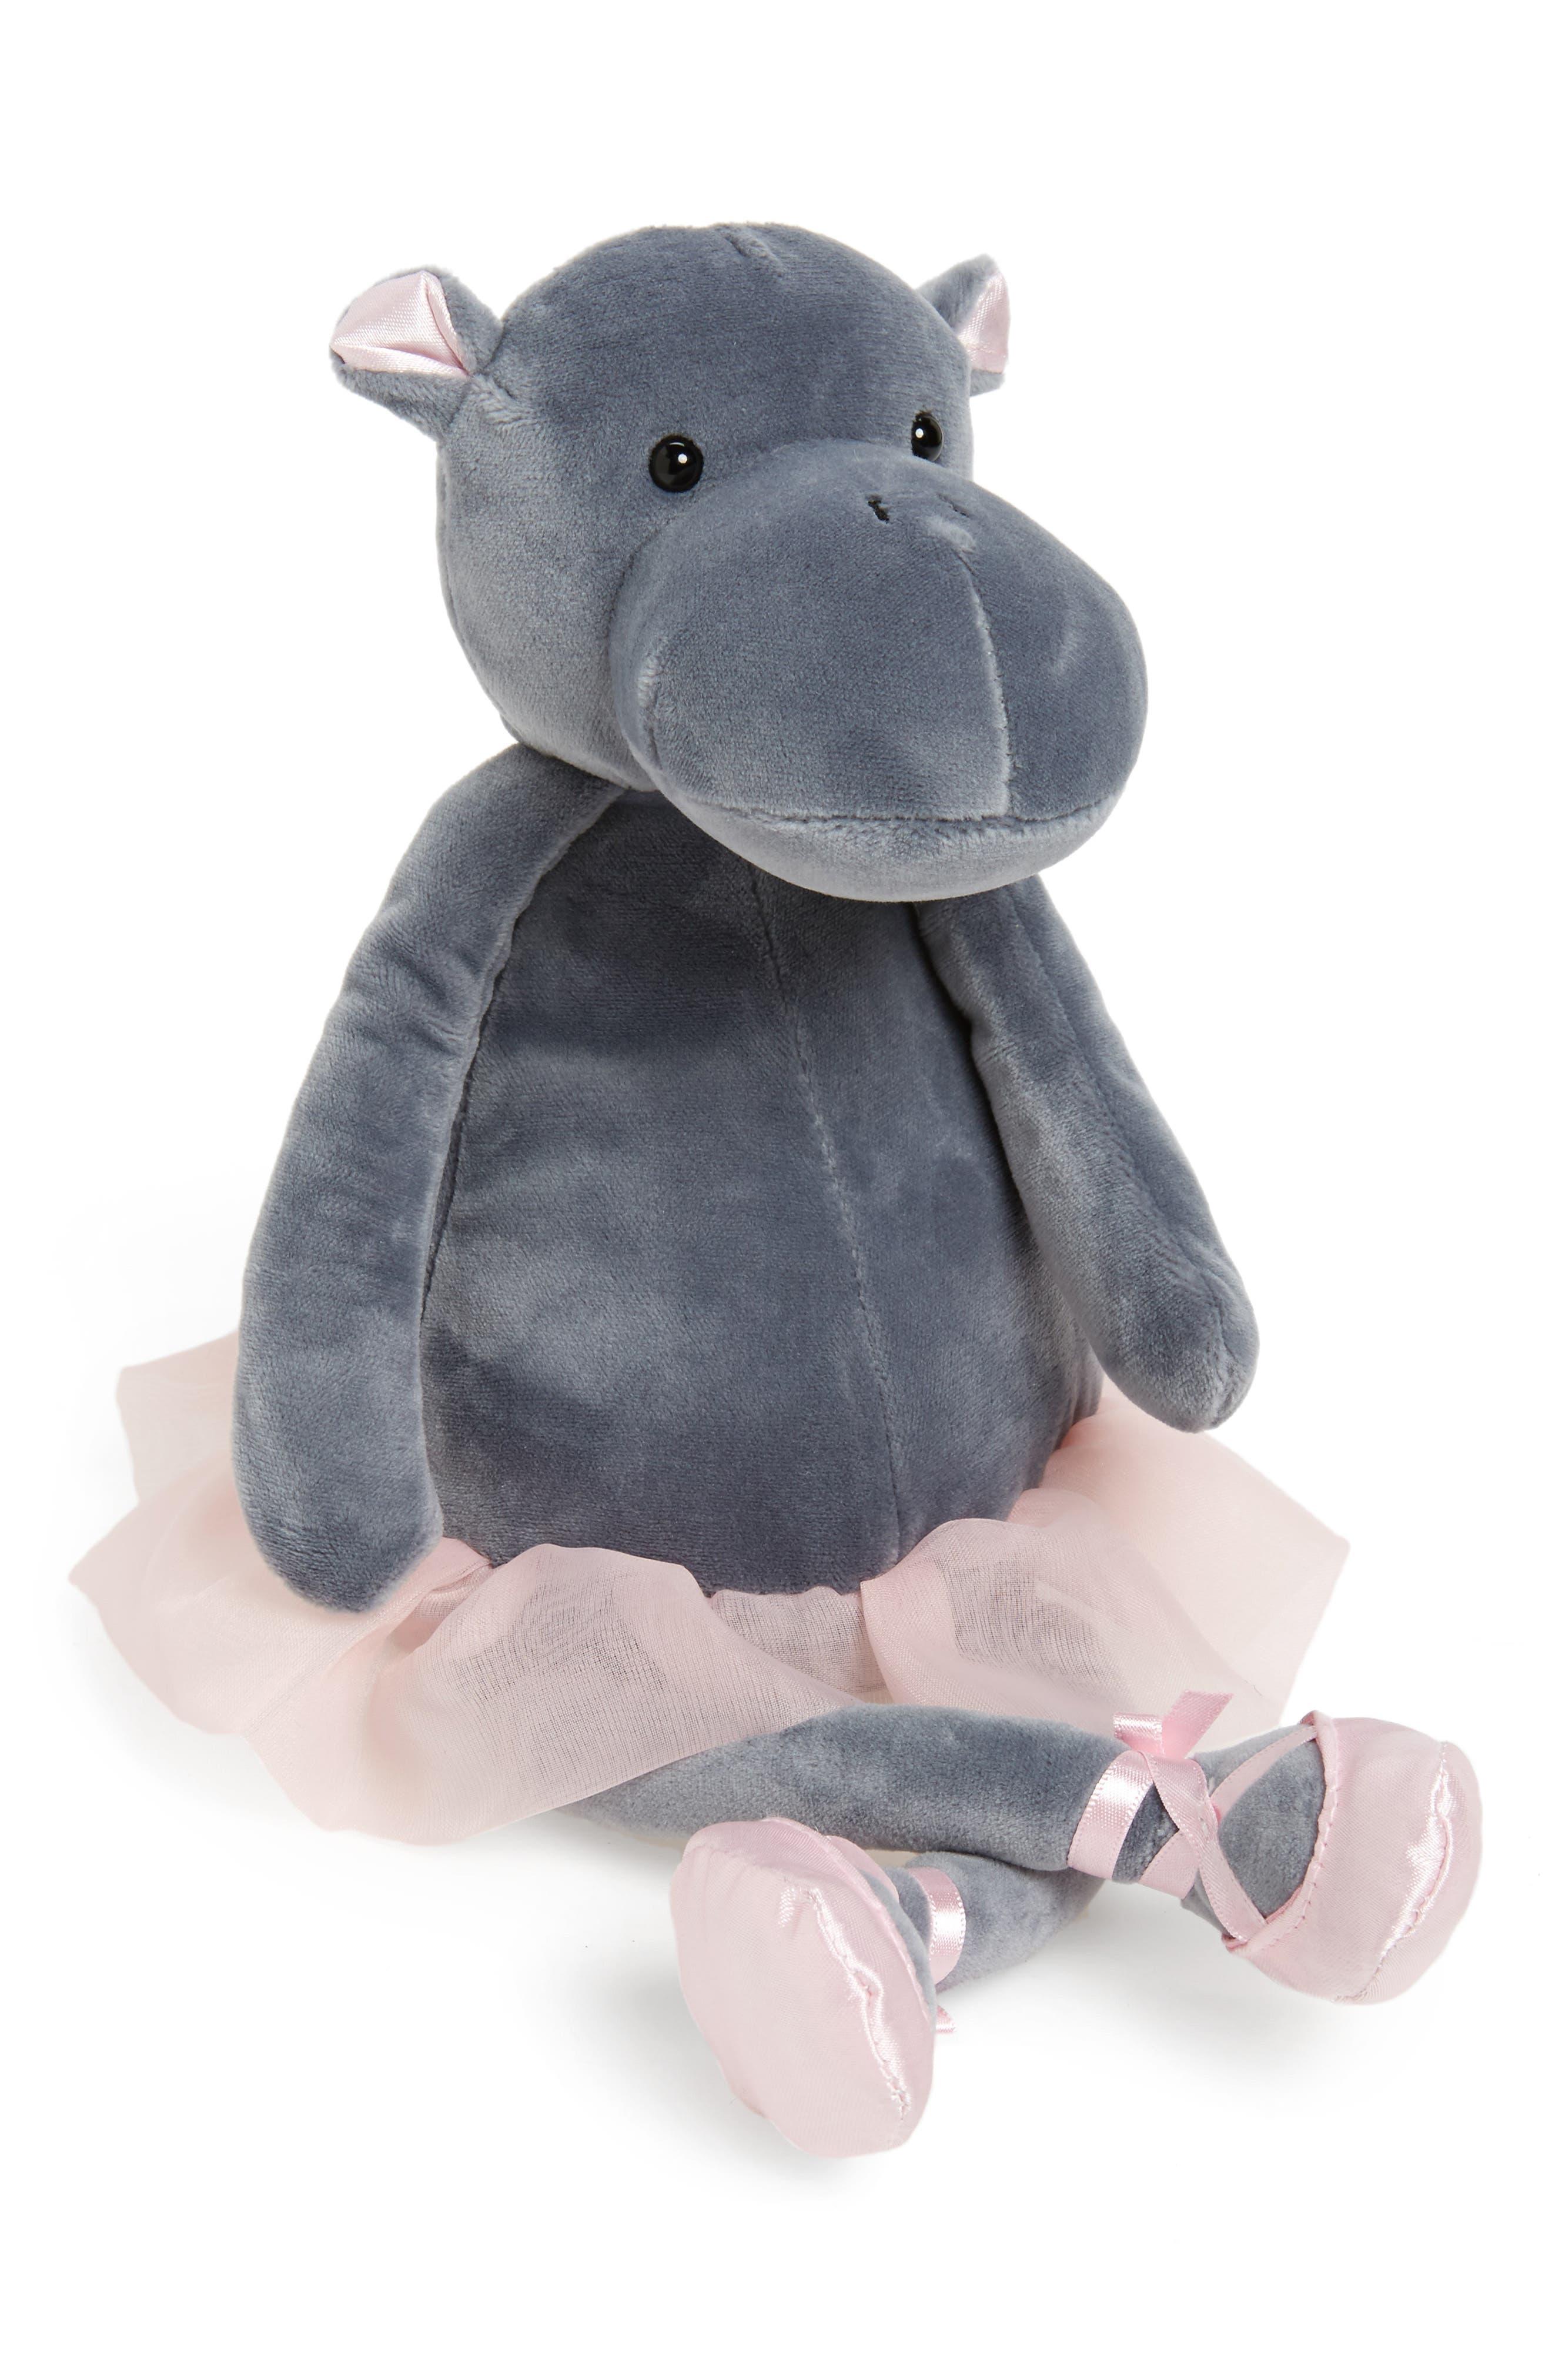 Main Image - Jellycat Dancing Darcey - Hippo Stuffed Animal